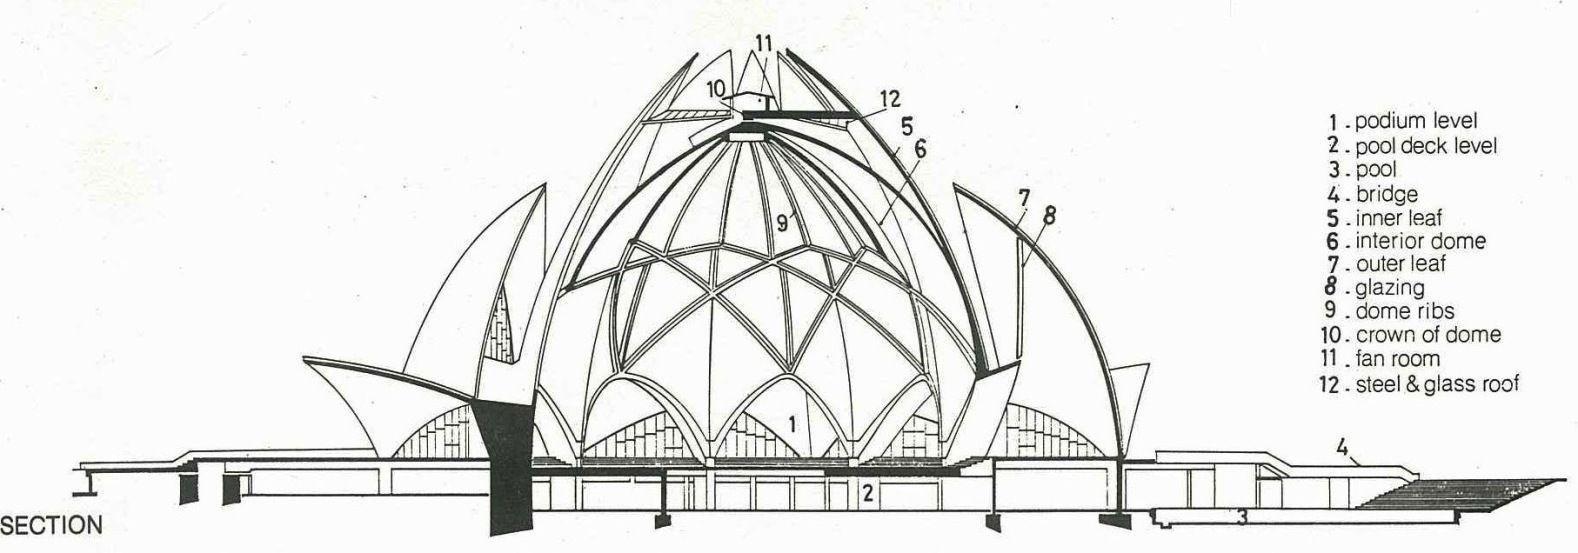 Lotus Temple A Symbol Of Excellence In Modern Indian Architecture Architecture Excellence Indian Lotus Modern En 2020 Con Imagenes Arquitectura India Templo Arquitectura